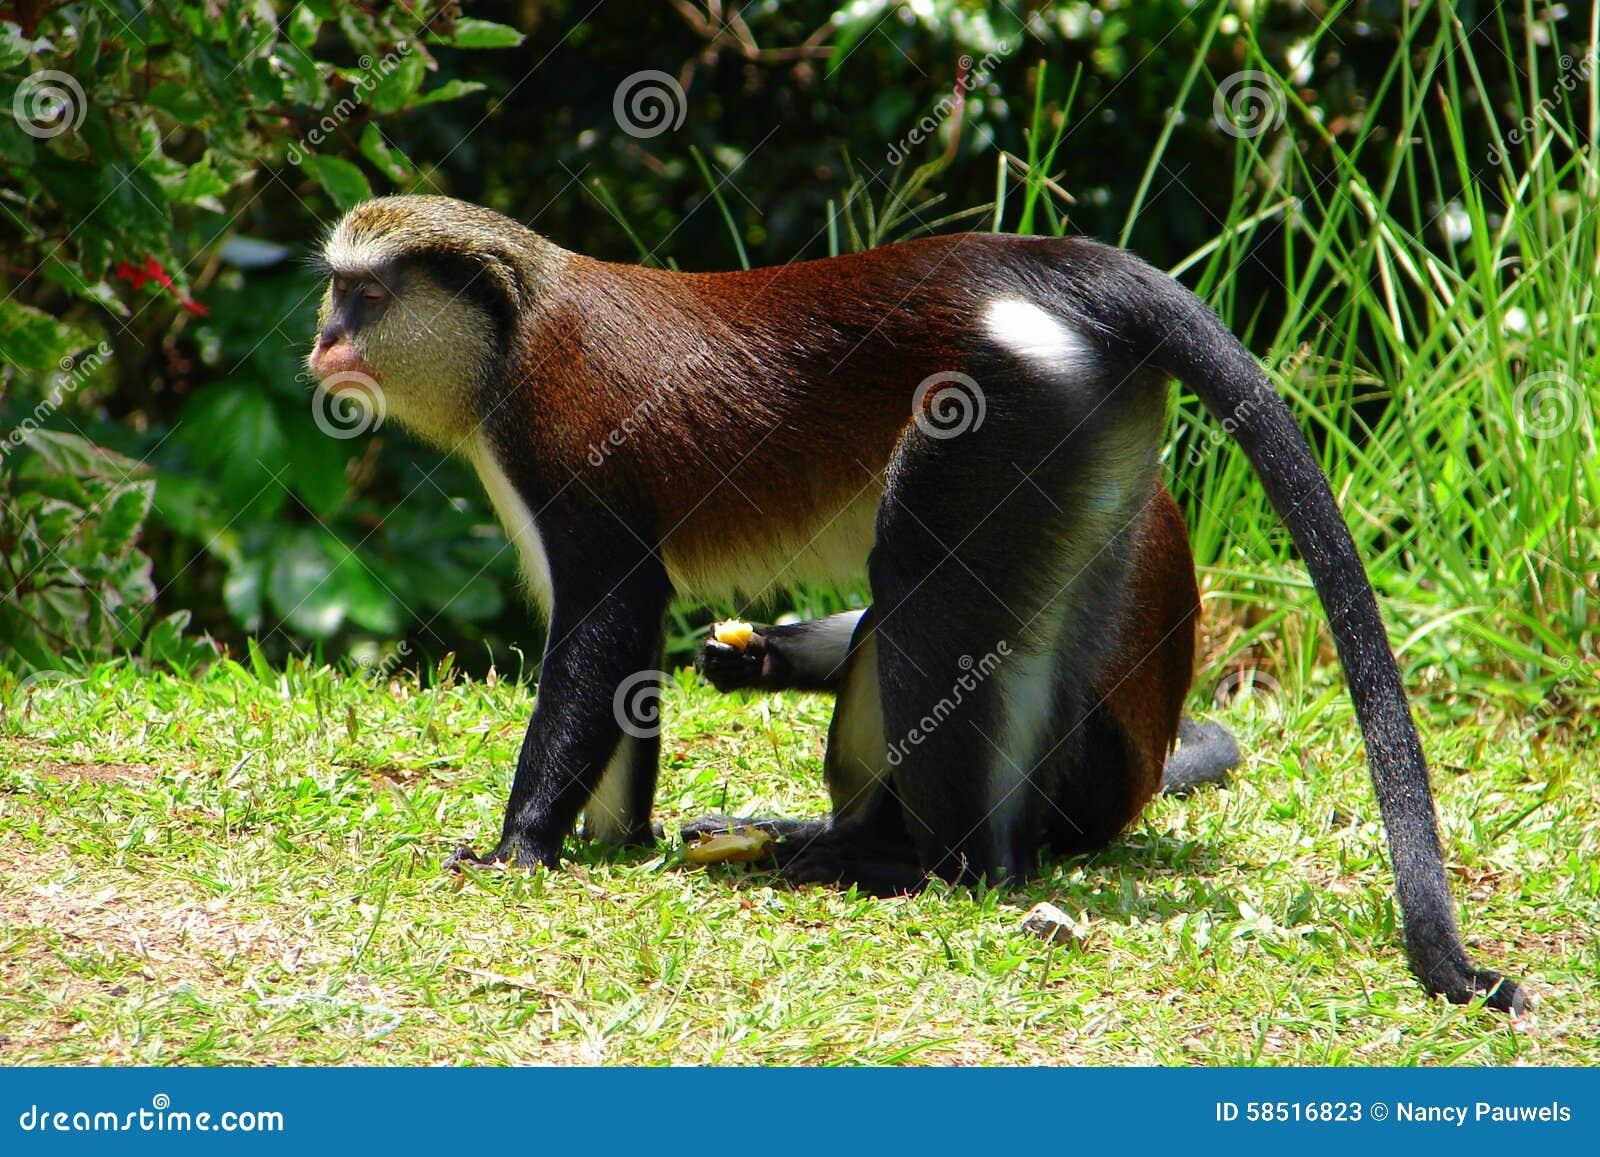 Mona Monkey on the grass.